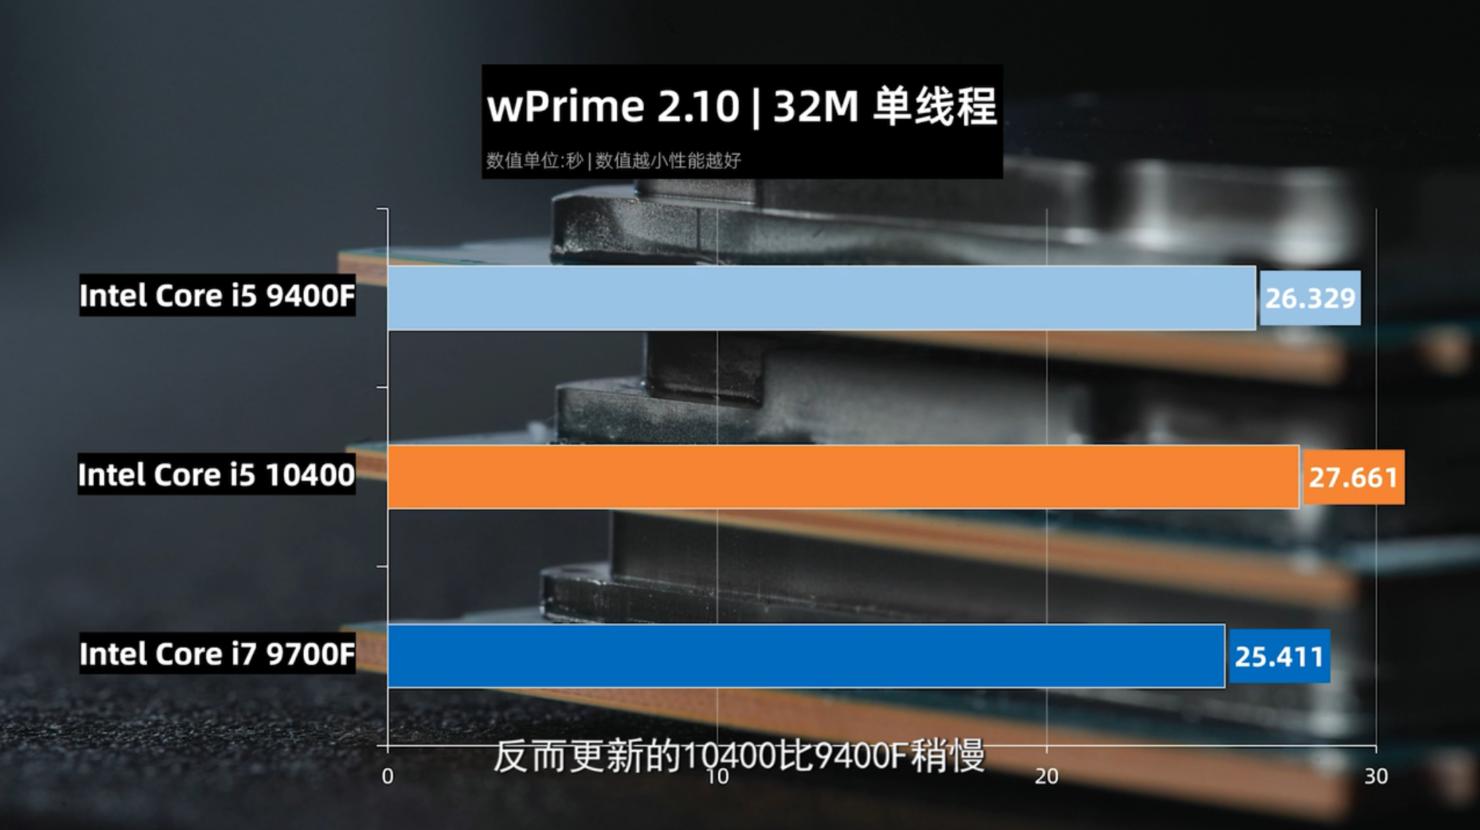 intel-core-i5-10400-comet-lake-s-6-core-desktop-cpu_wprime